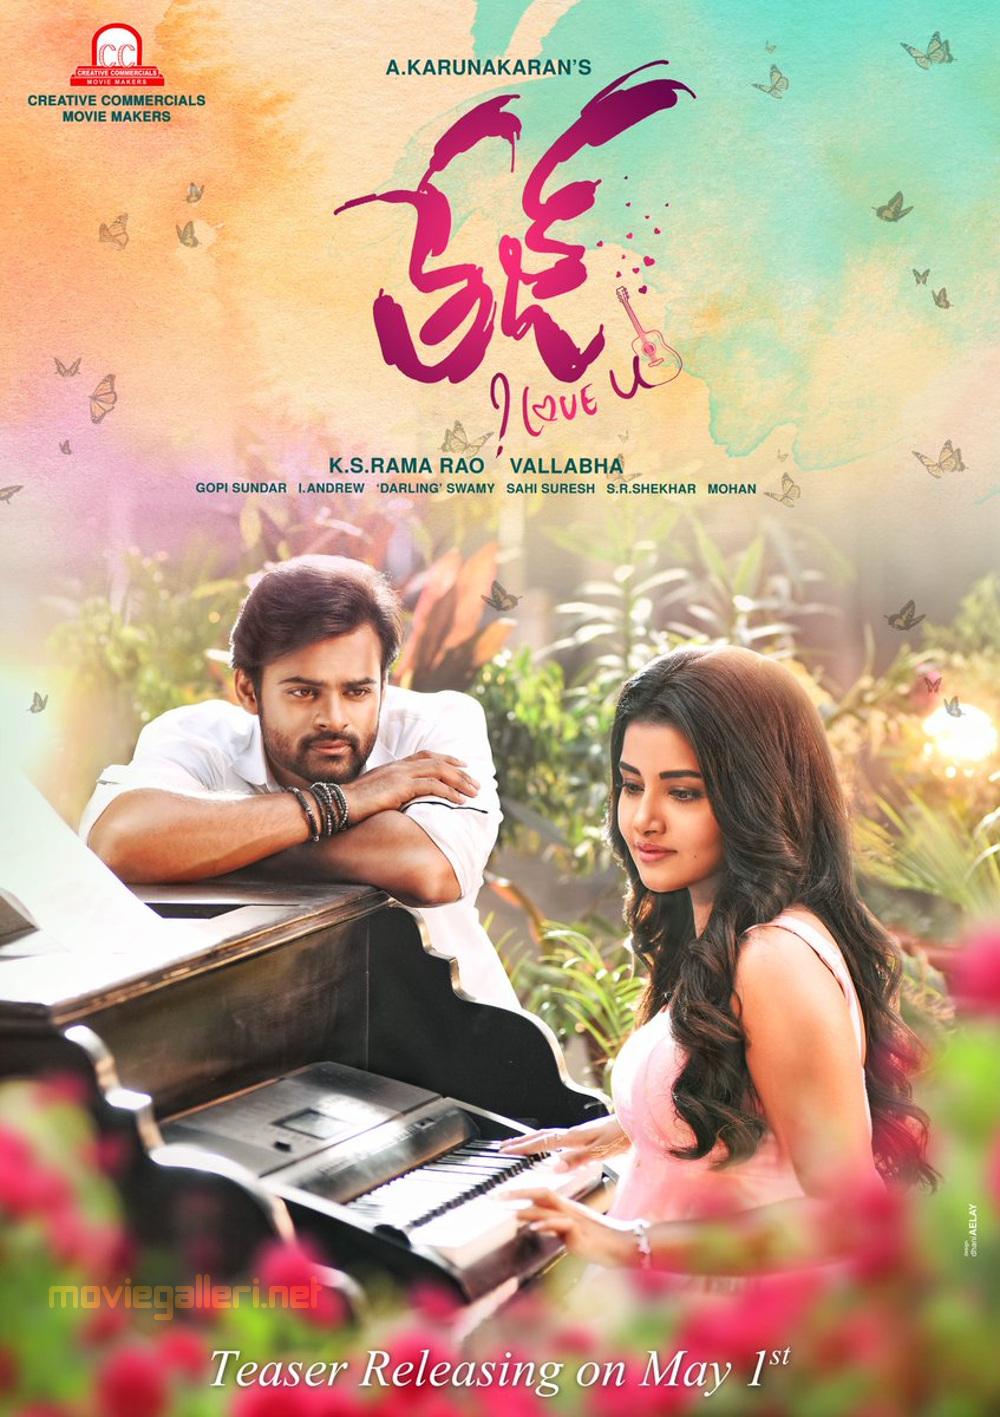 Sai Dharam Tej Anupama Parameswaran Tej I Love You Movie First Look Poster